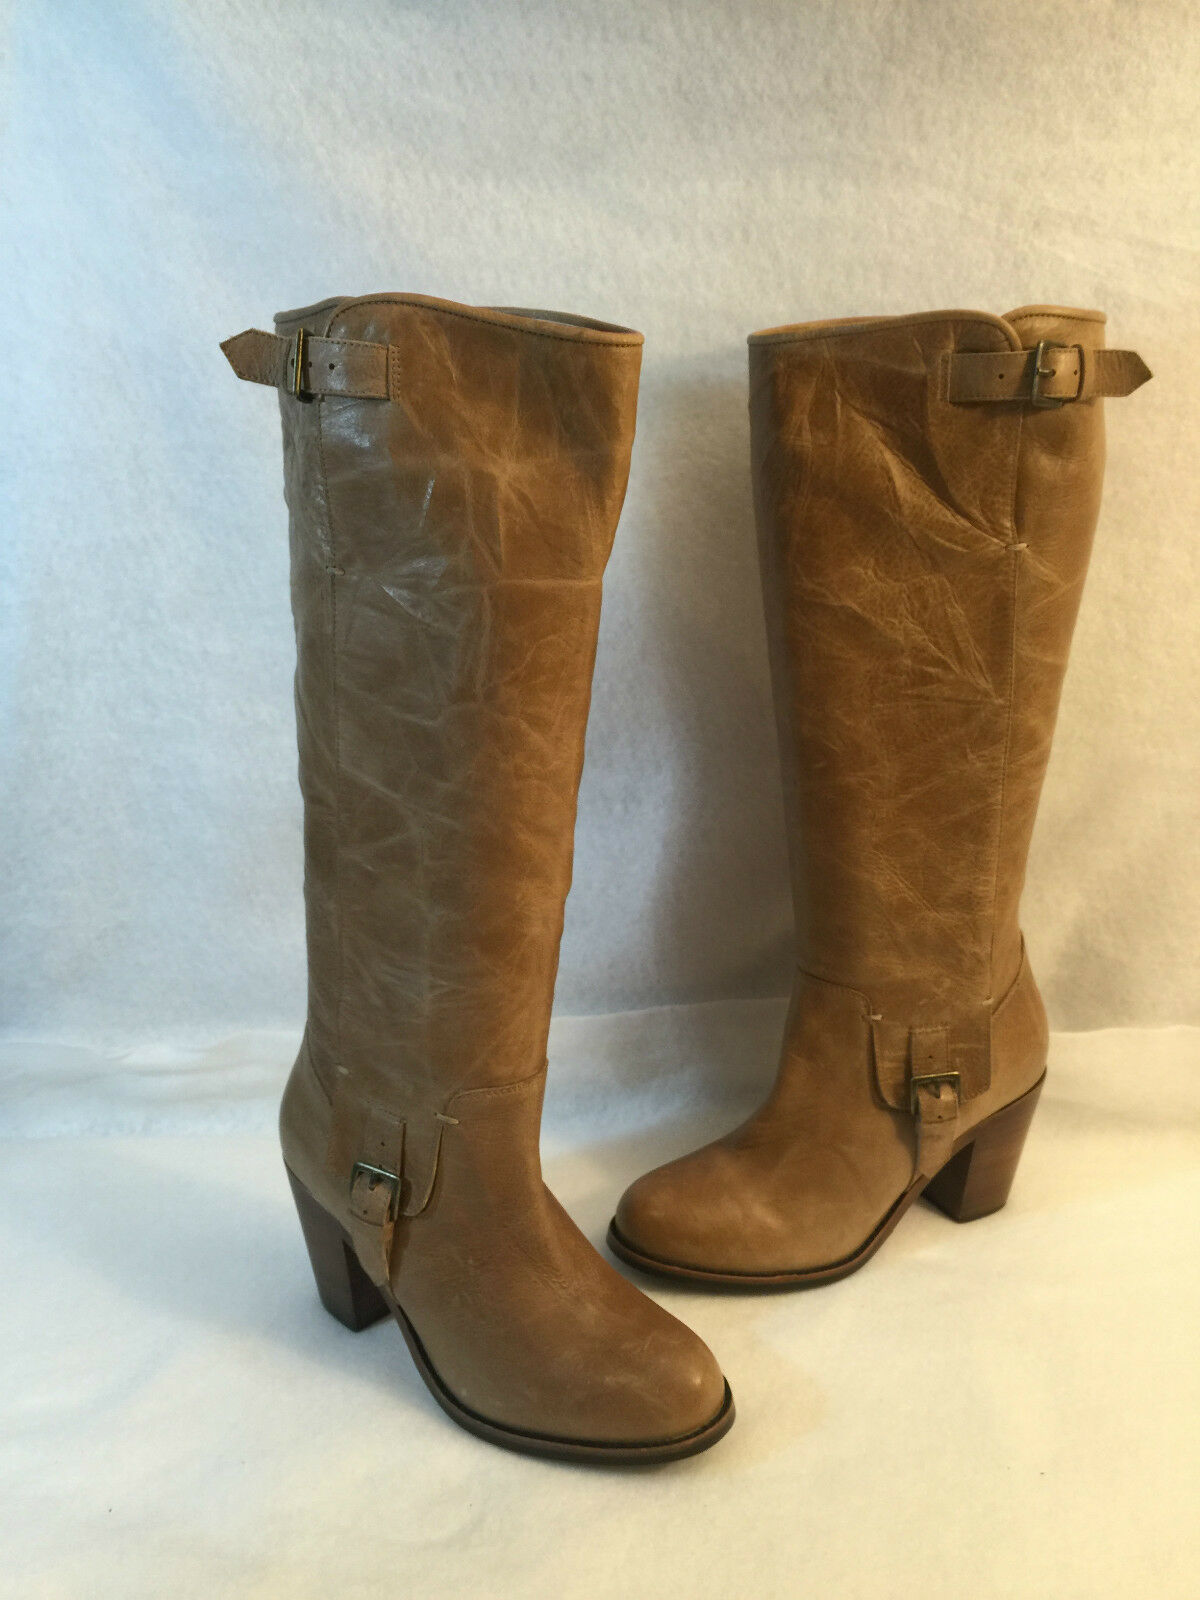 Ariat Knee High Dress Casual Western Boot Heels 7 Tan Leder Round Toe 7 Heels B 92167a